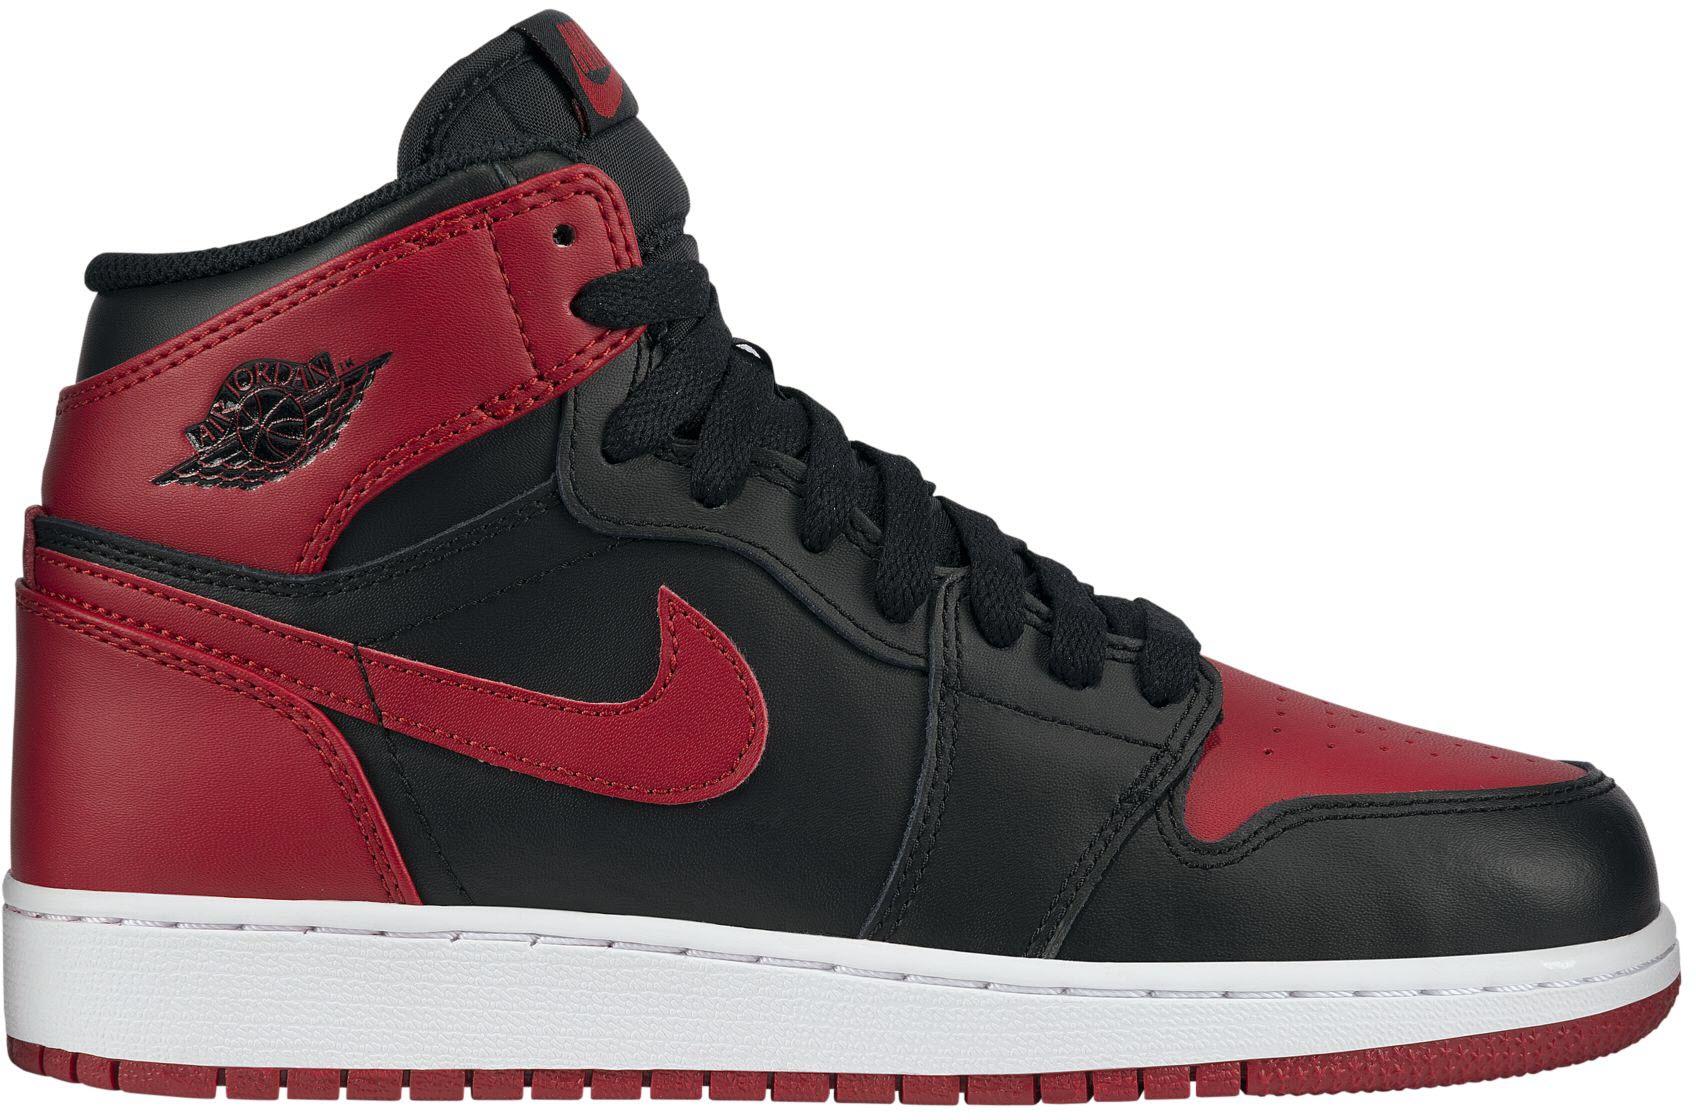 Jordan 1 Retro Bred 2013 (GS) - 575441-023